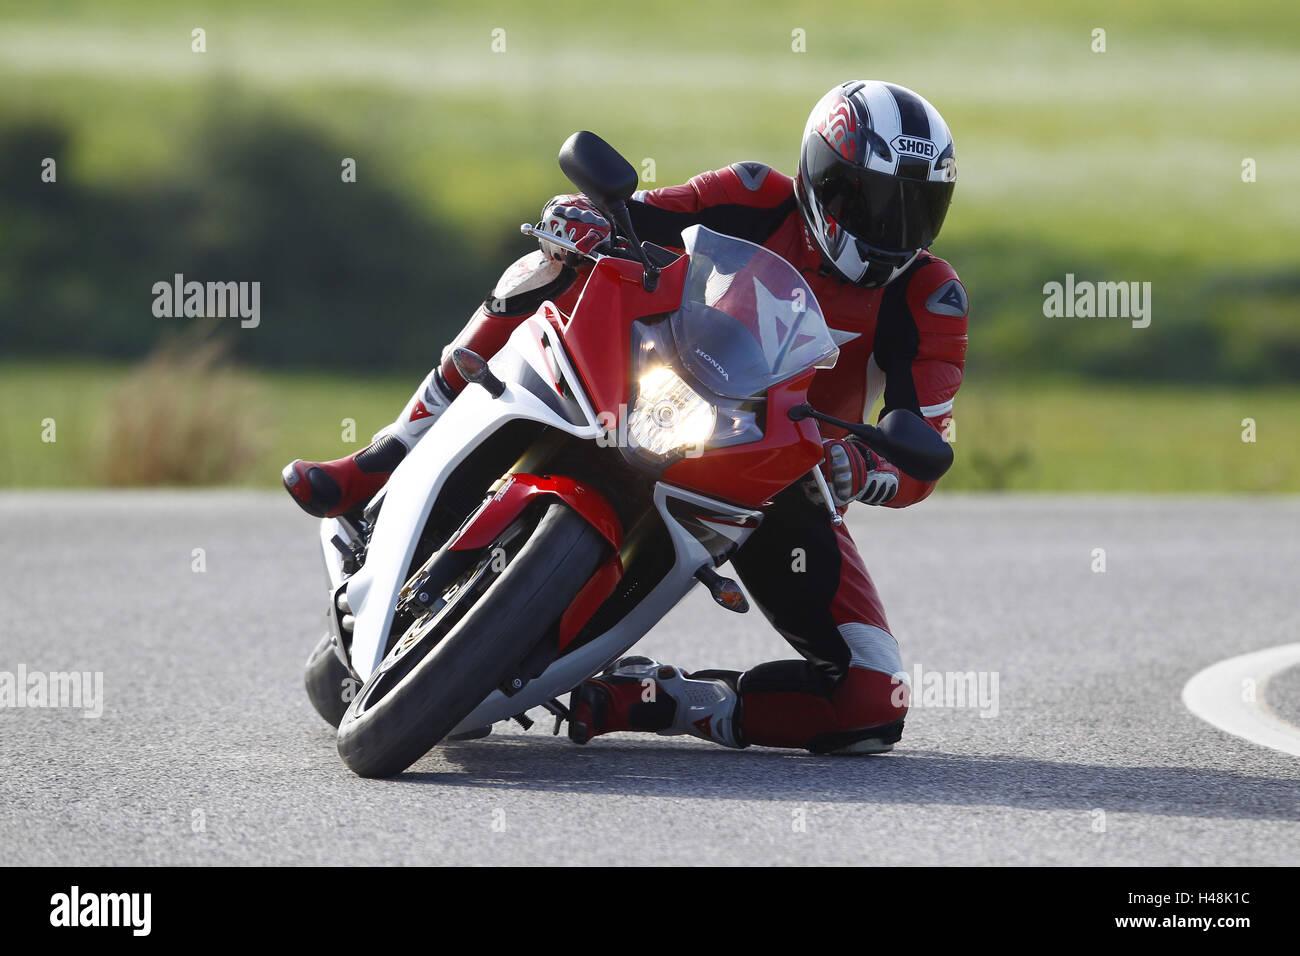 Motorcycle, Honda CBR 600 F, curve, tilt, moving, head-on, knee on ground, - Stock Image